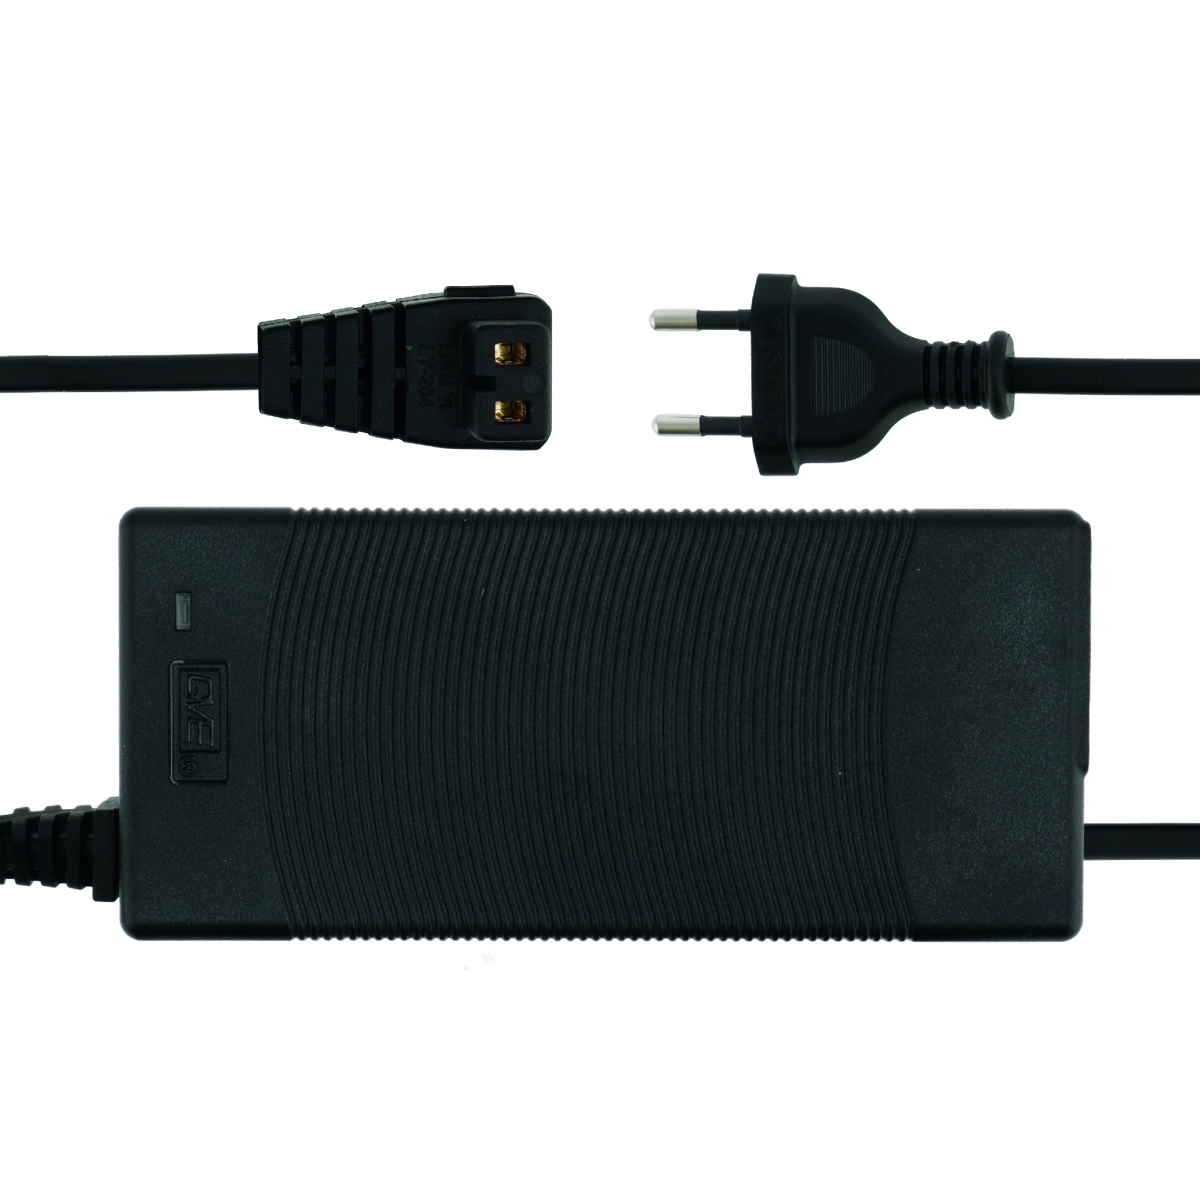 Mestic Netzadapter für MCC-25 & 35